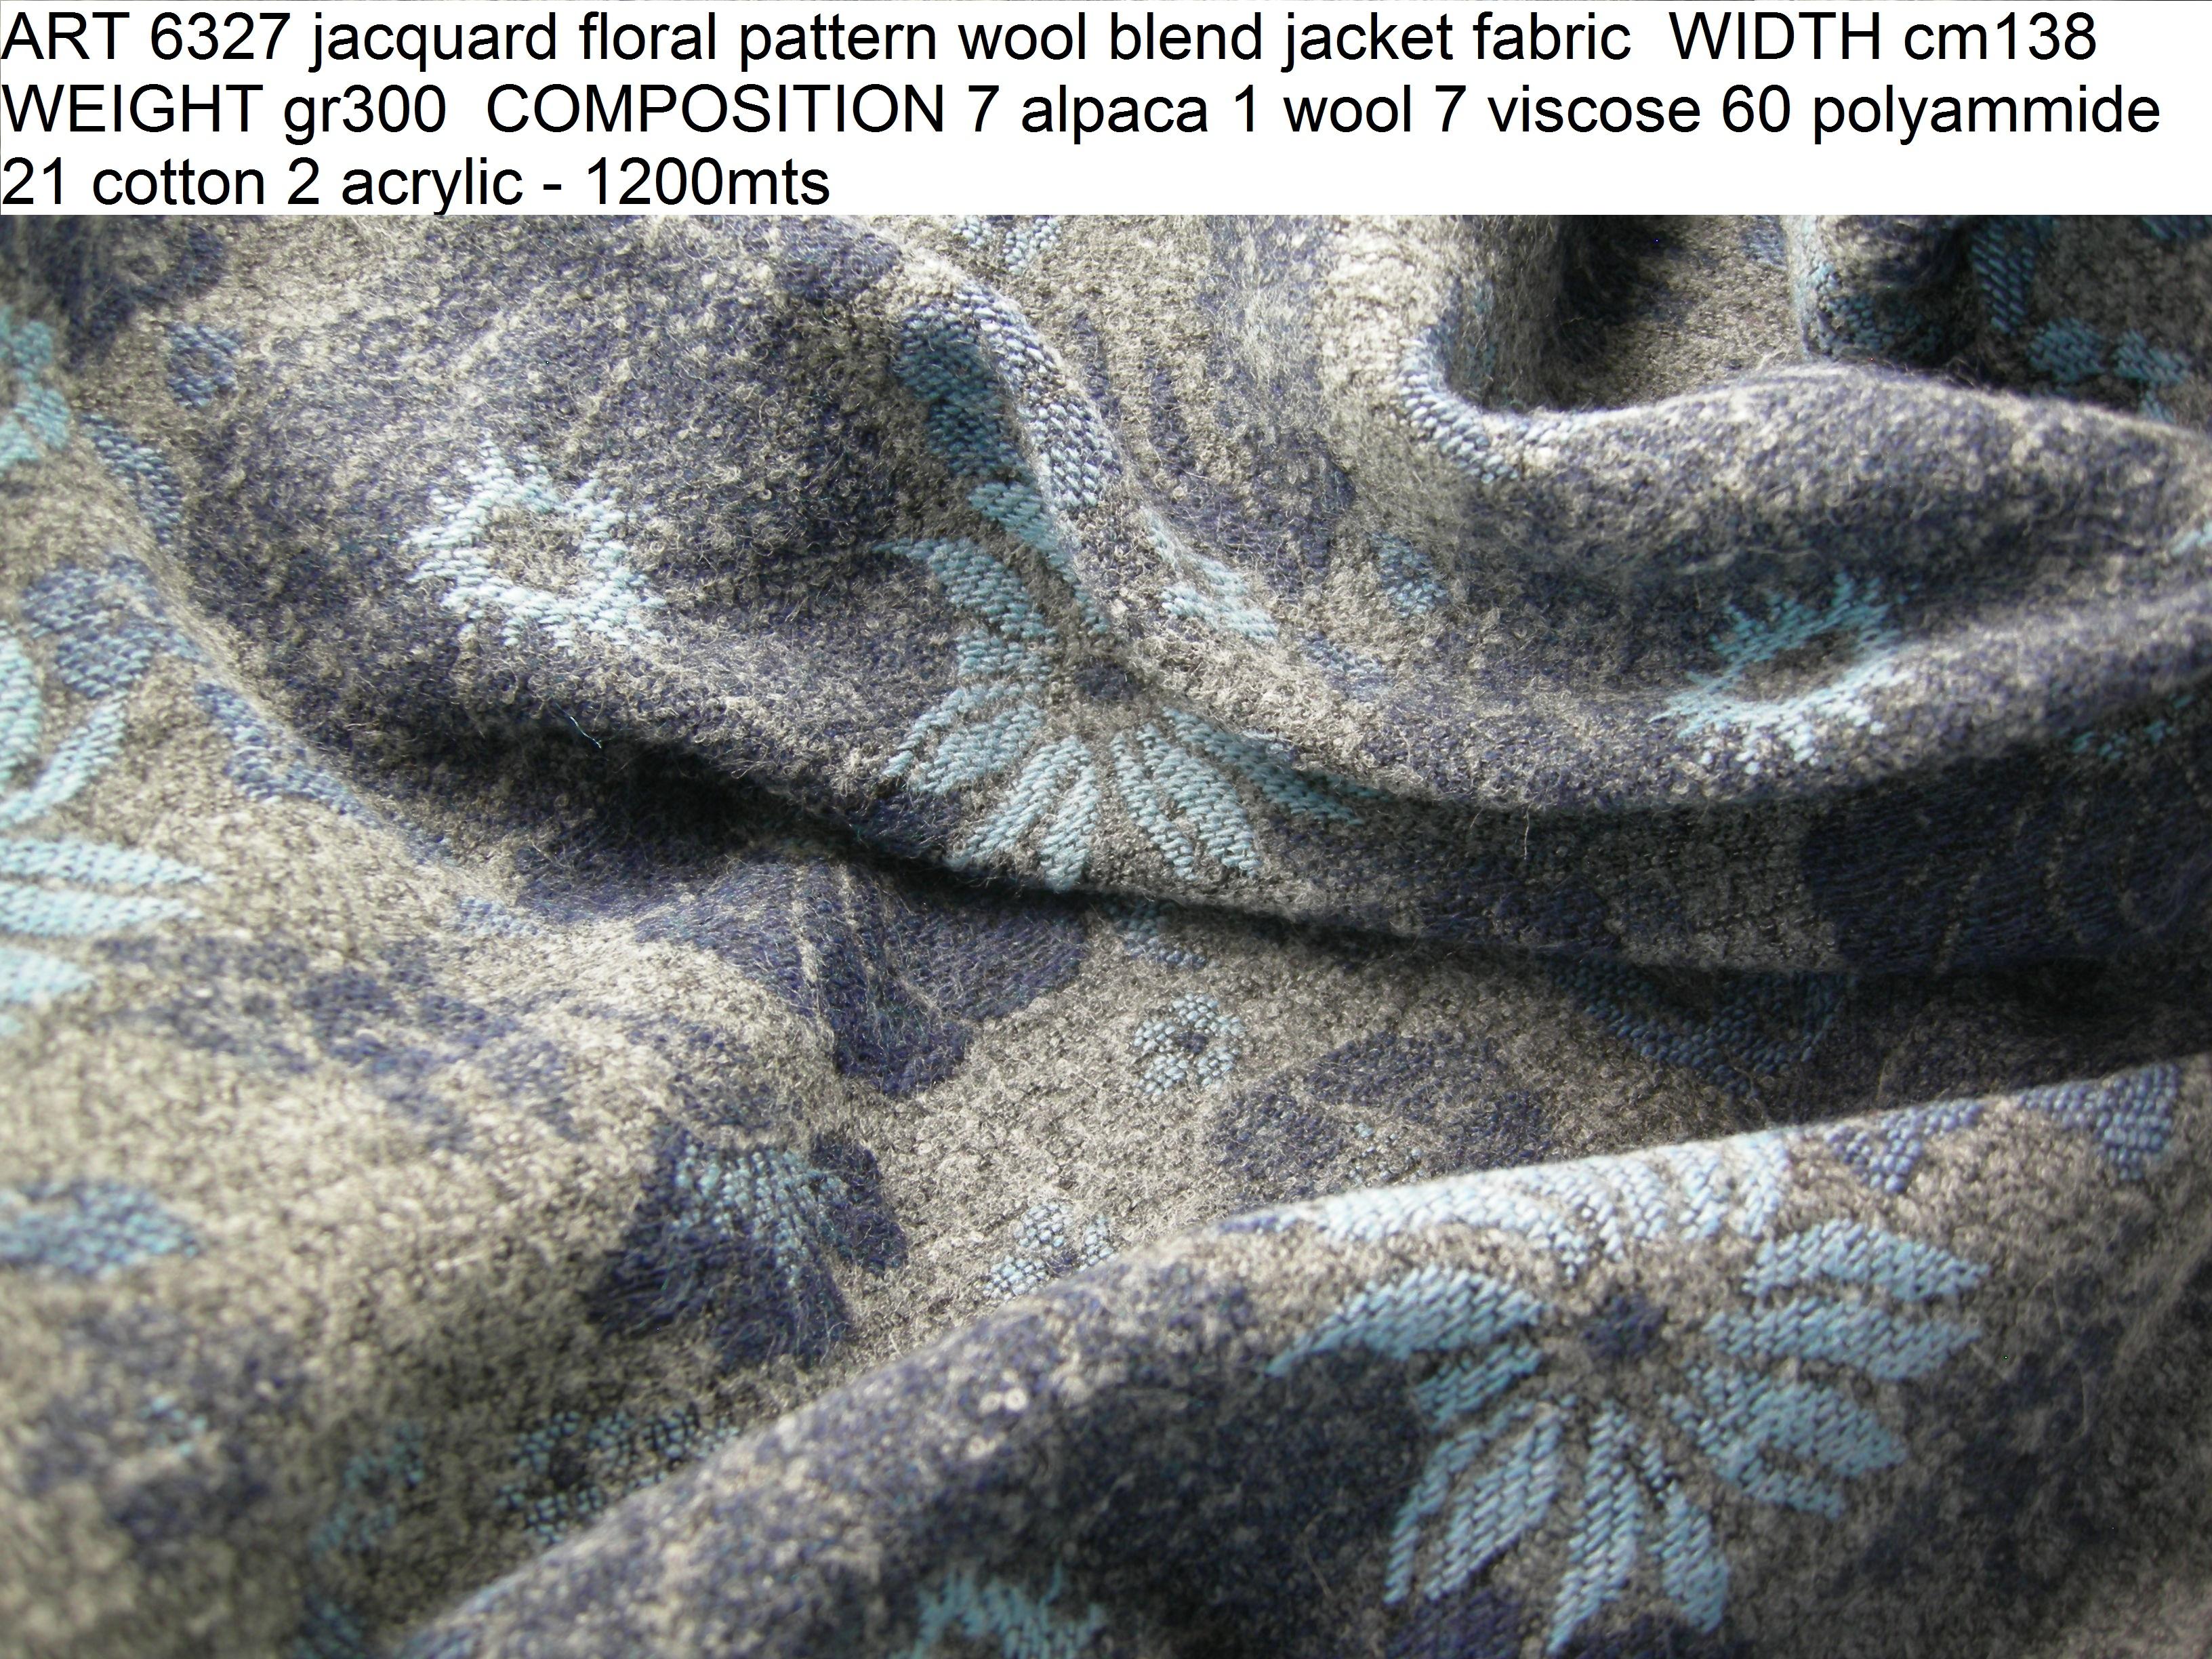 ART 6327 jacquard floral pattern wool blend jacket fabric WIDTH cm138 WEIGHT gr300 COMPOSITION 7 alpaca 1 wool 7 viscose 60 polyammide 21 cotton 2 acrylic - 1200mts